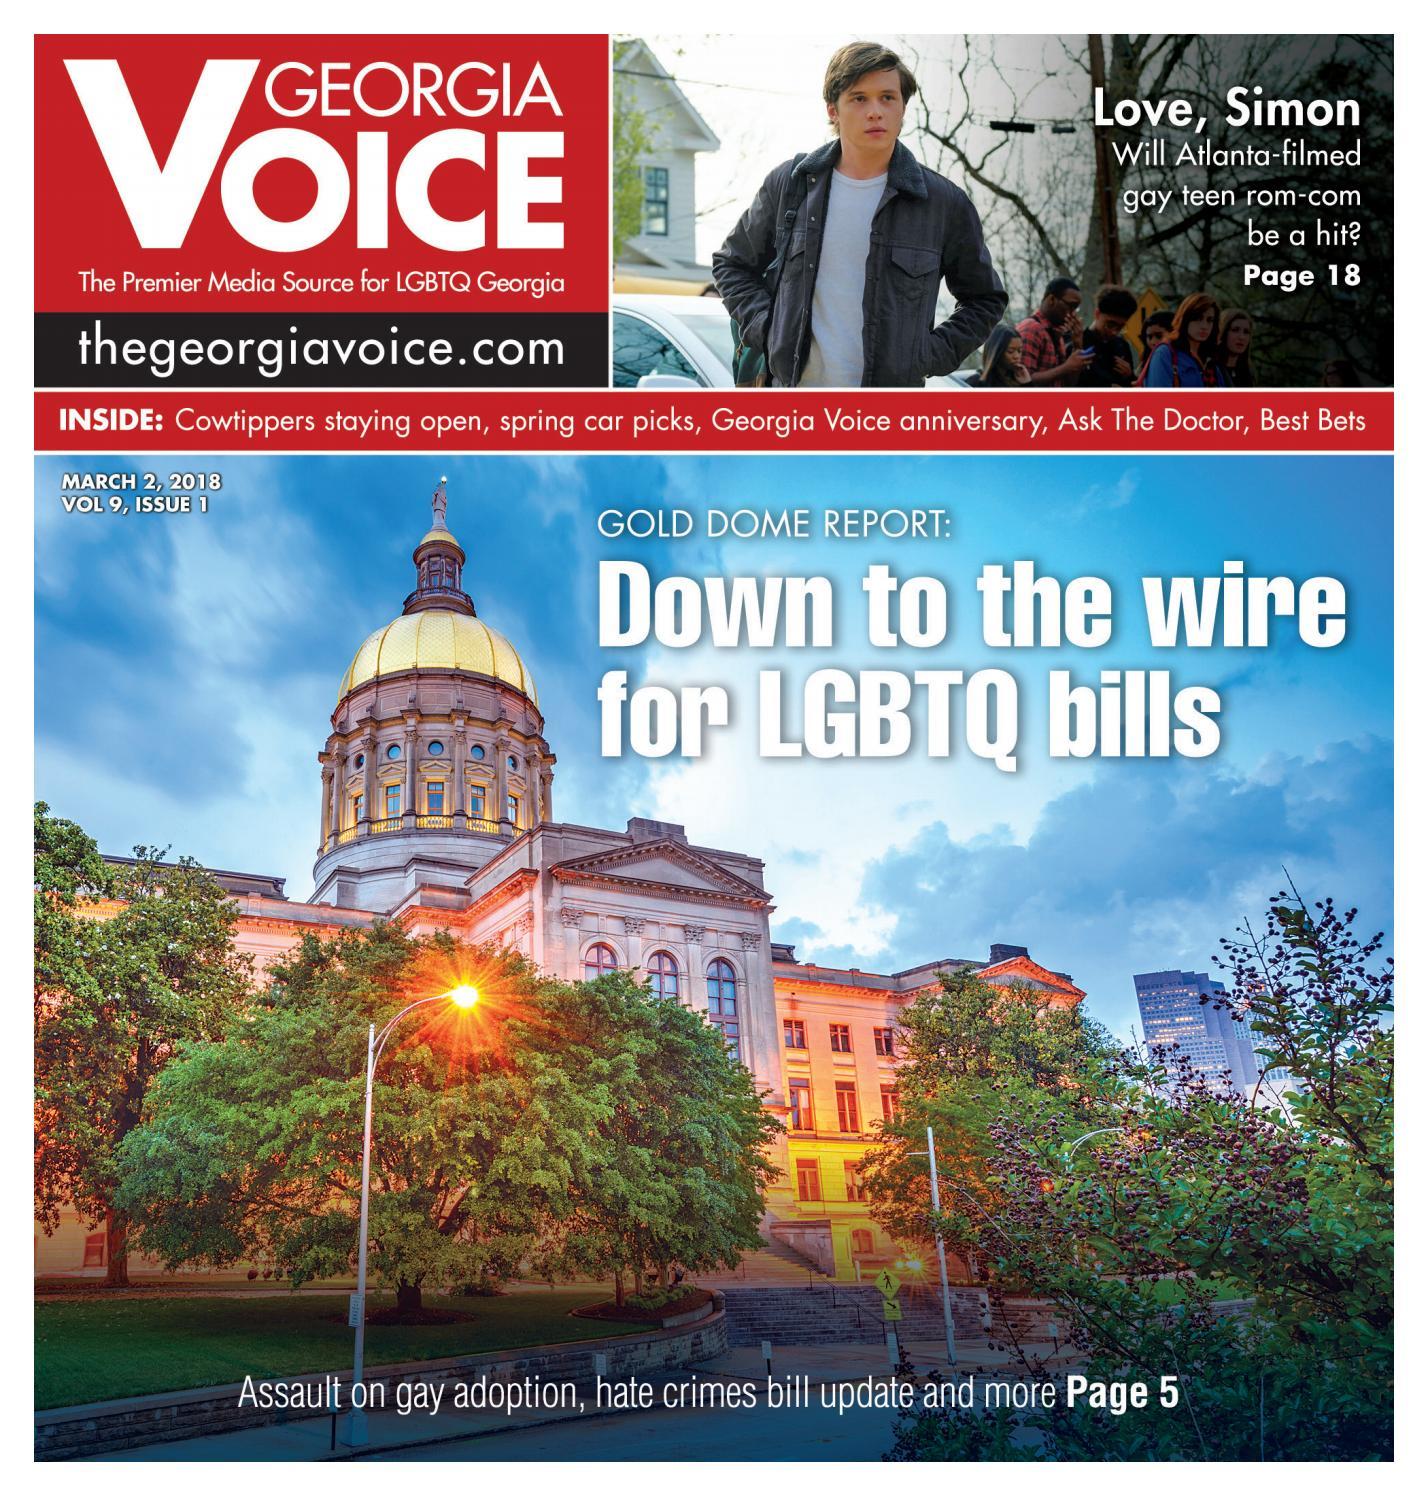 03/02/18, Vol. 9 Issue 1 by Georgia Voice - issuu